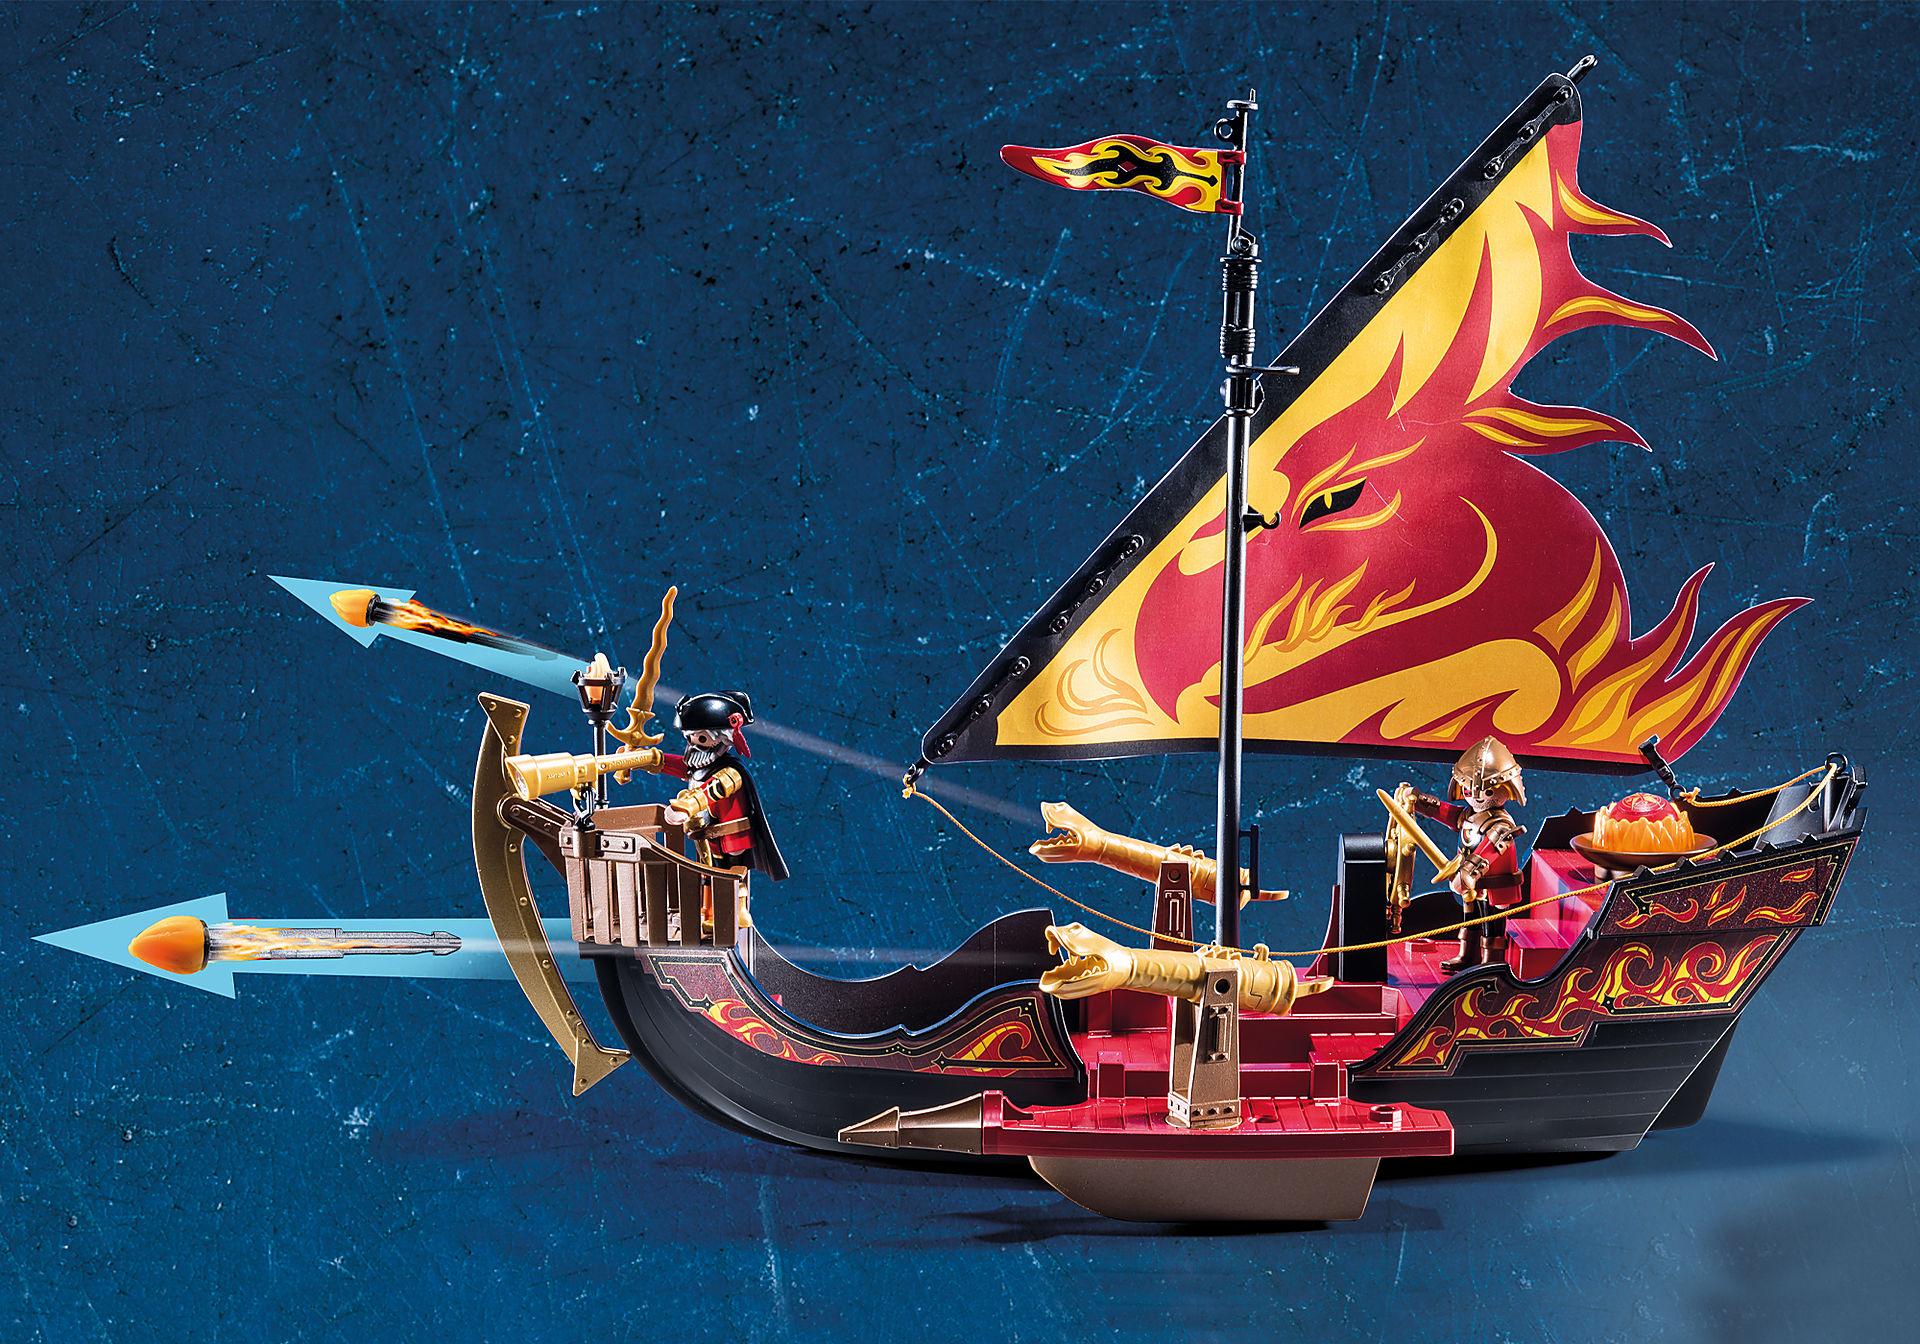 70641 Burnham Raiders Feuerschiff zoom image10